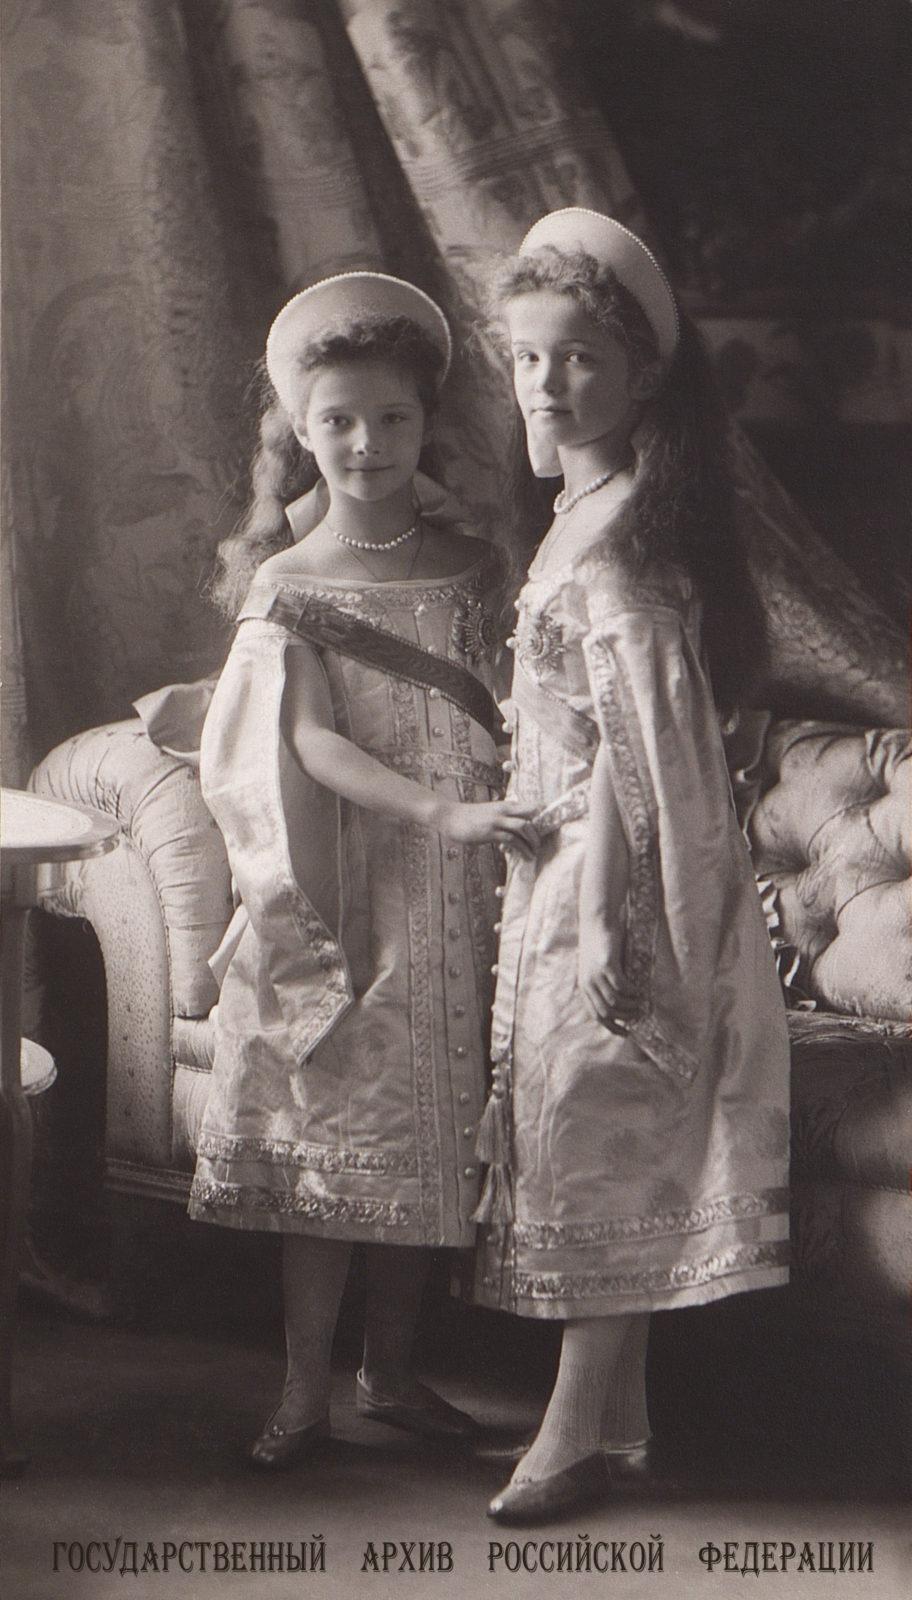 Grand Duchesses Tatiana and Olga . 1905 .